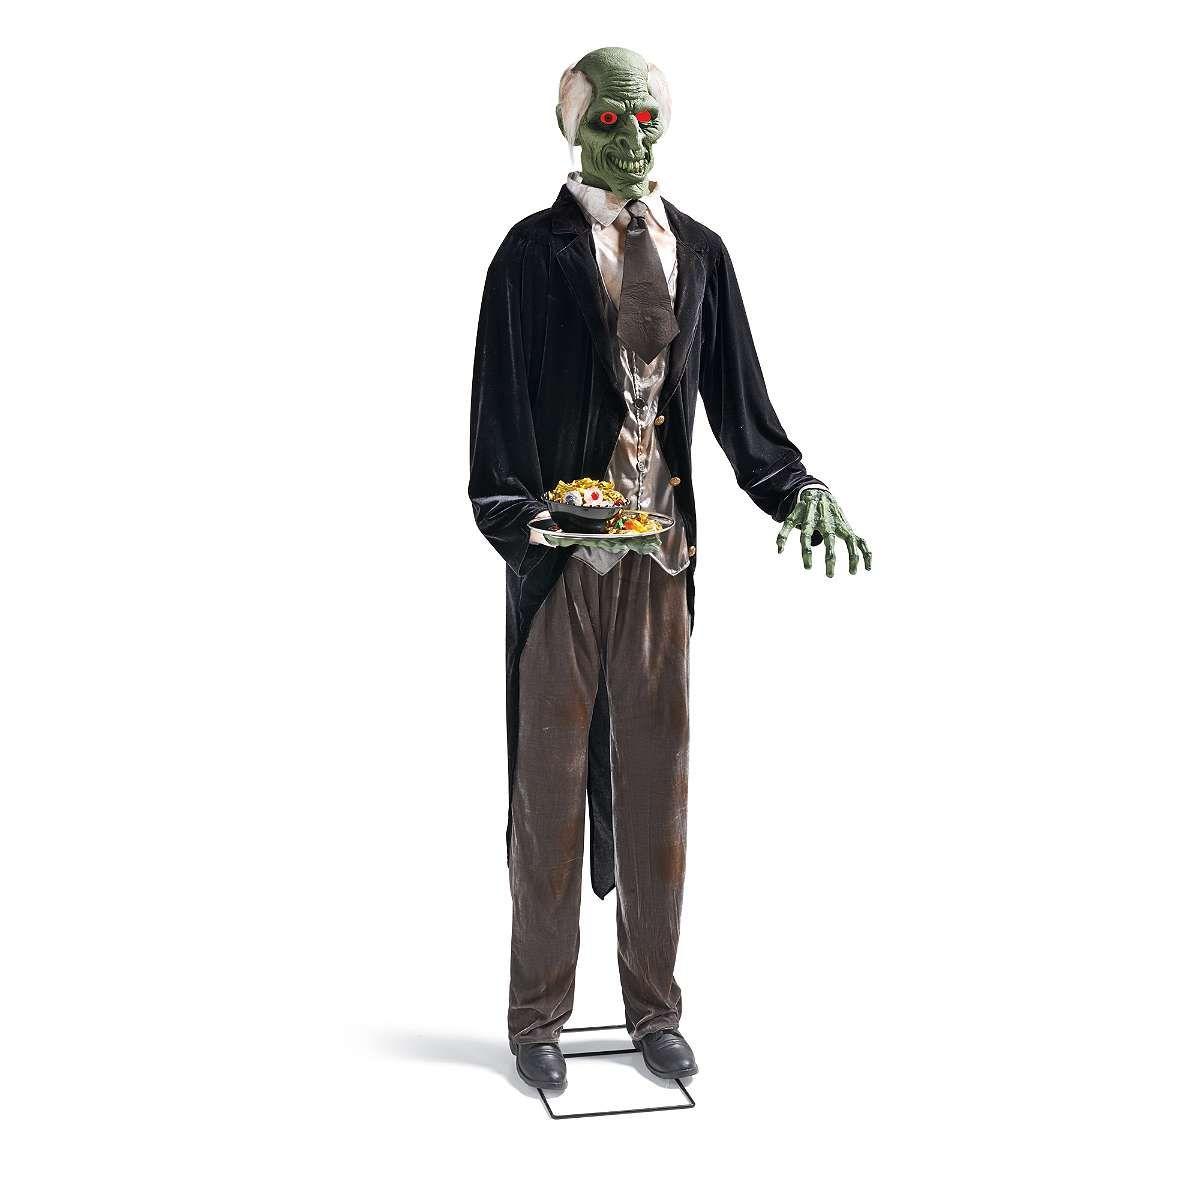 Winston The Butler Animated Figure - Grandin Road